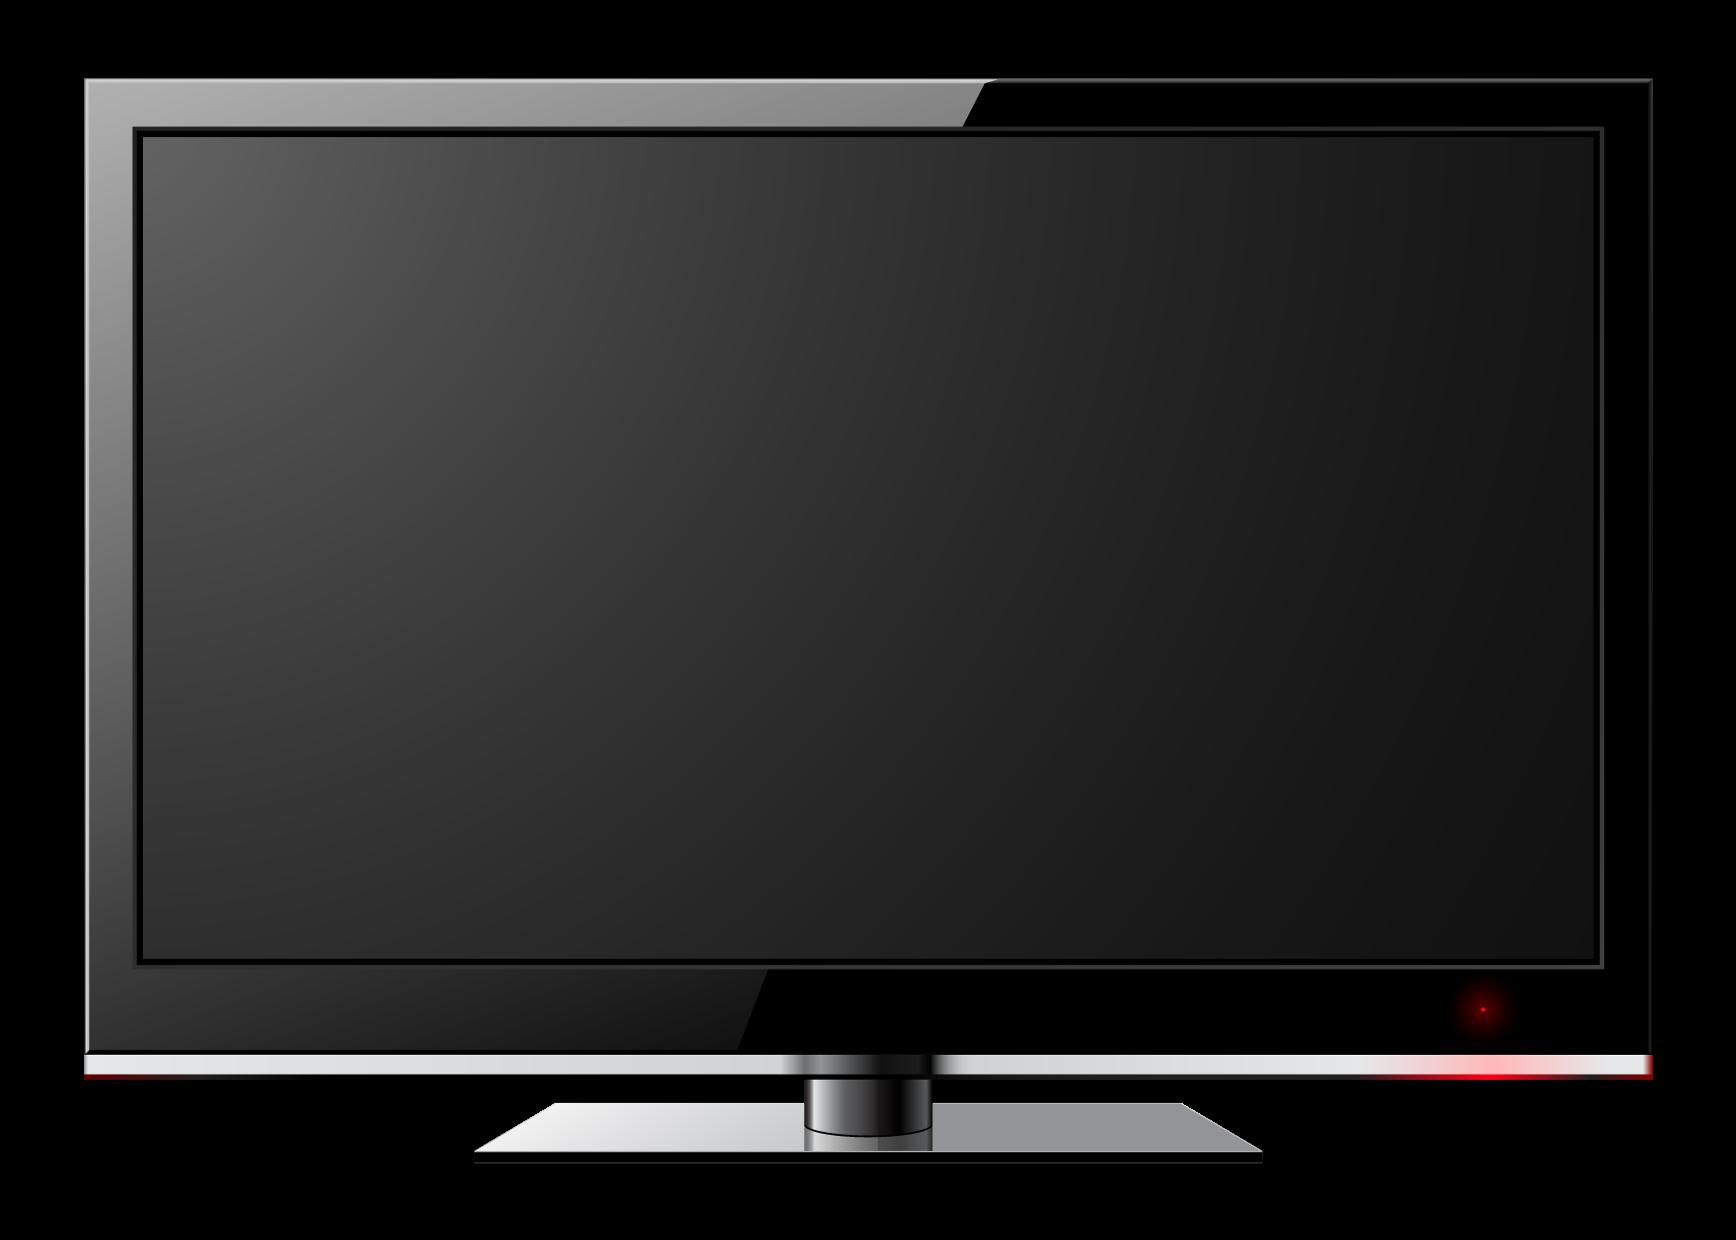 lcd tv icon - photo #20